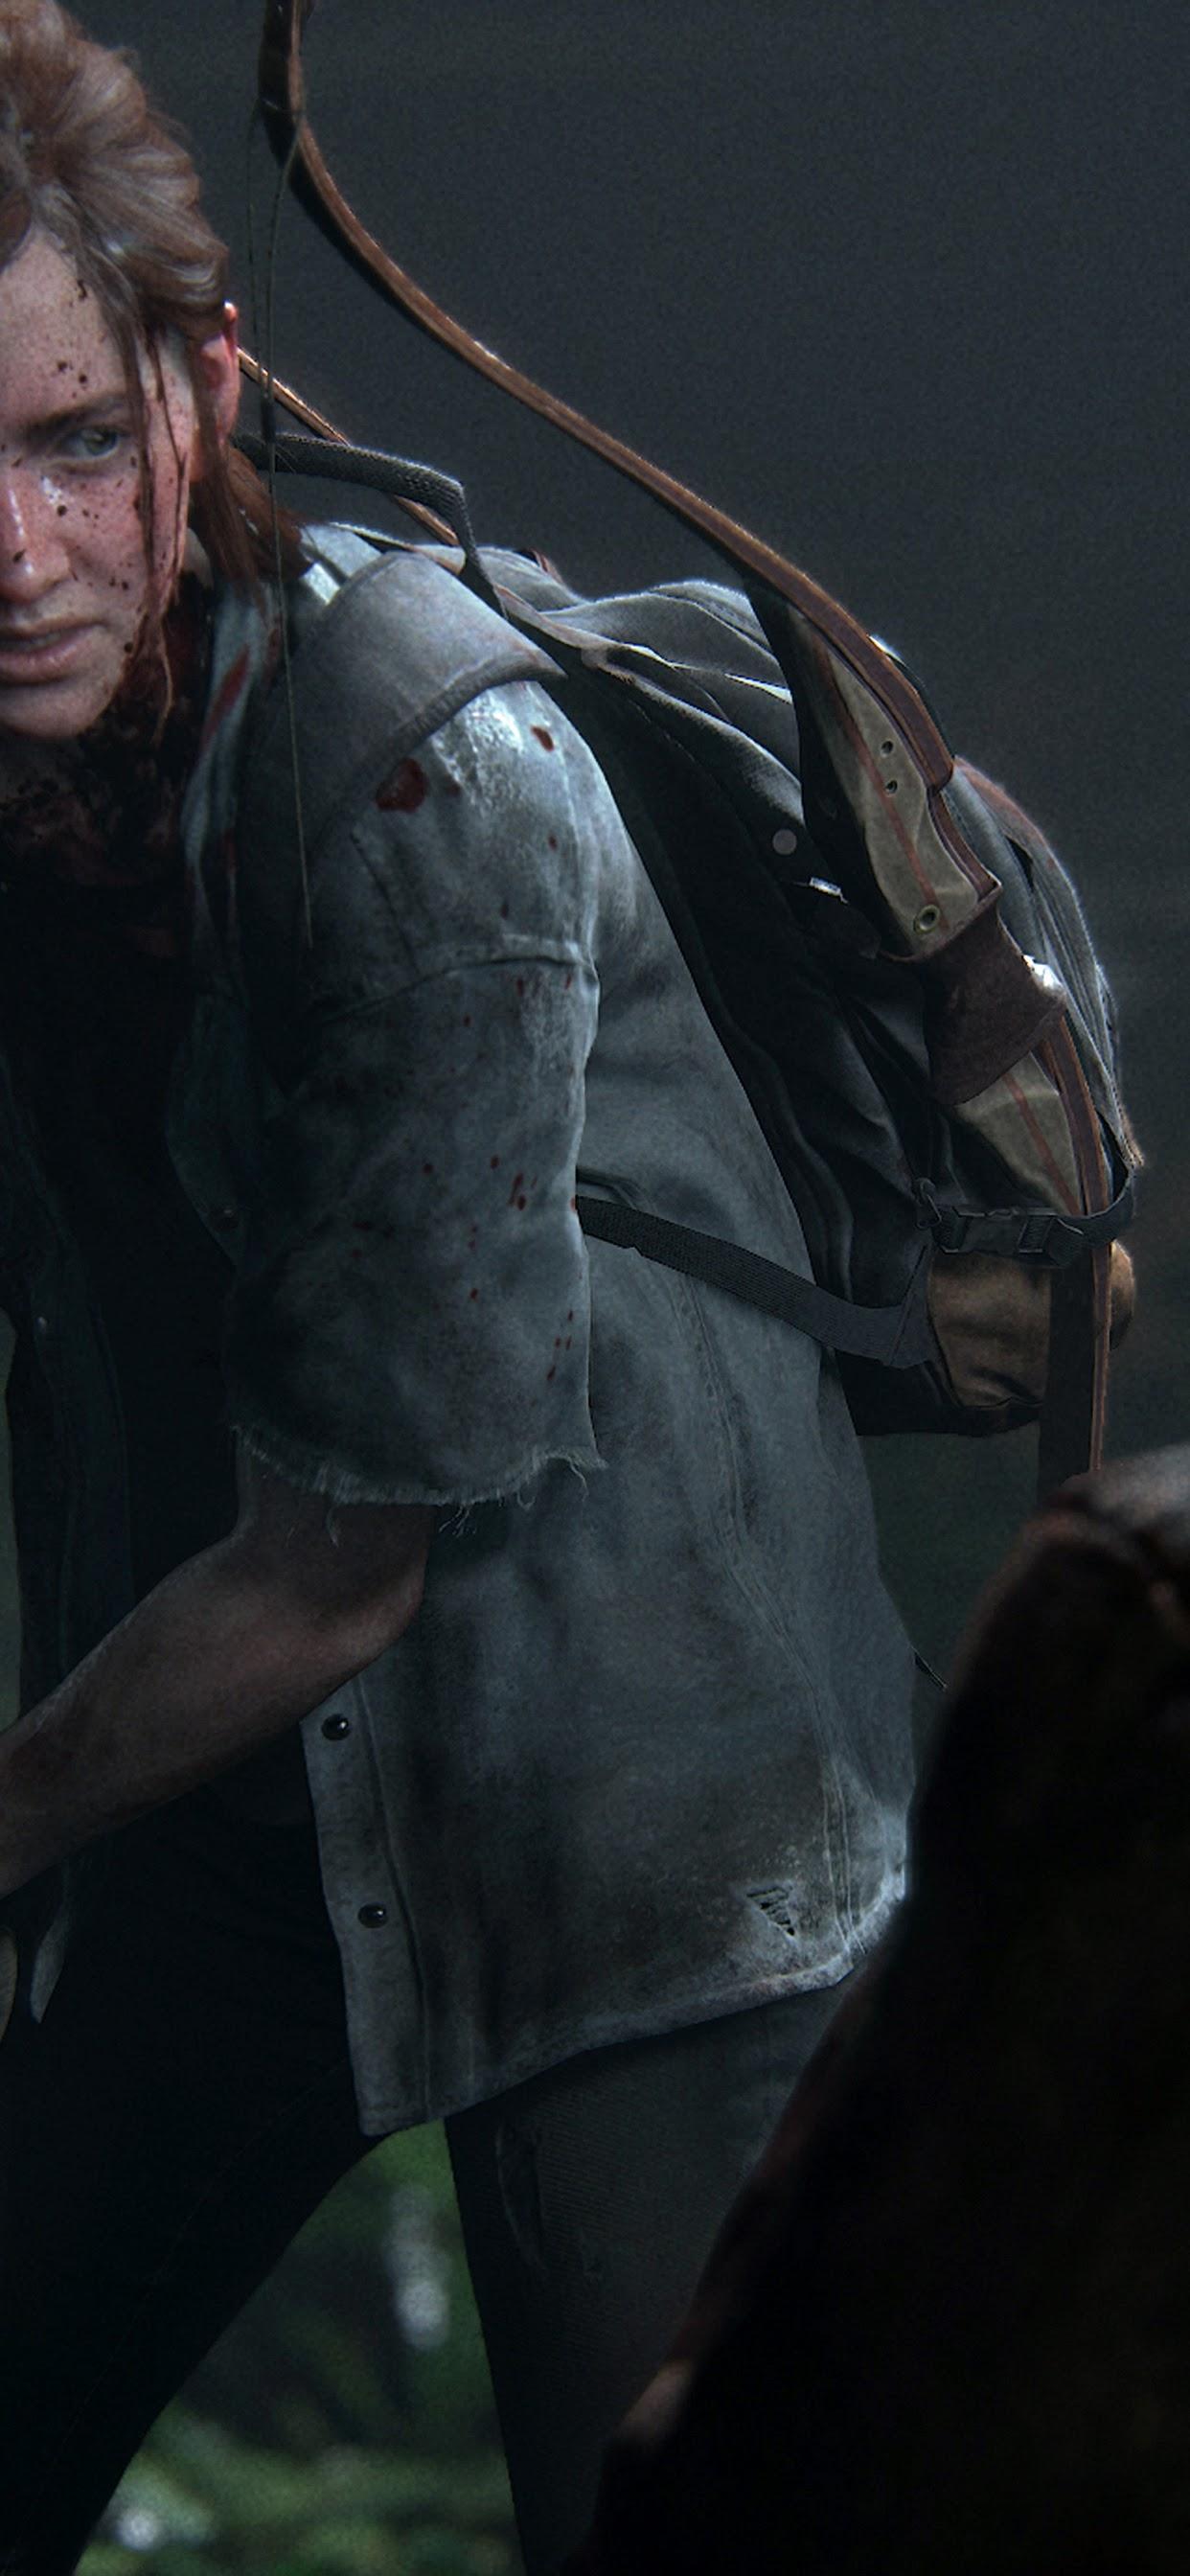 The Last Of Us Part 2 Ellie 4k Wallpaper 5